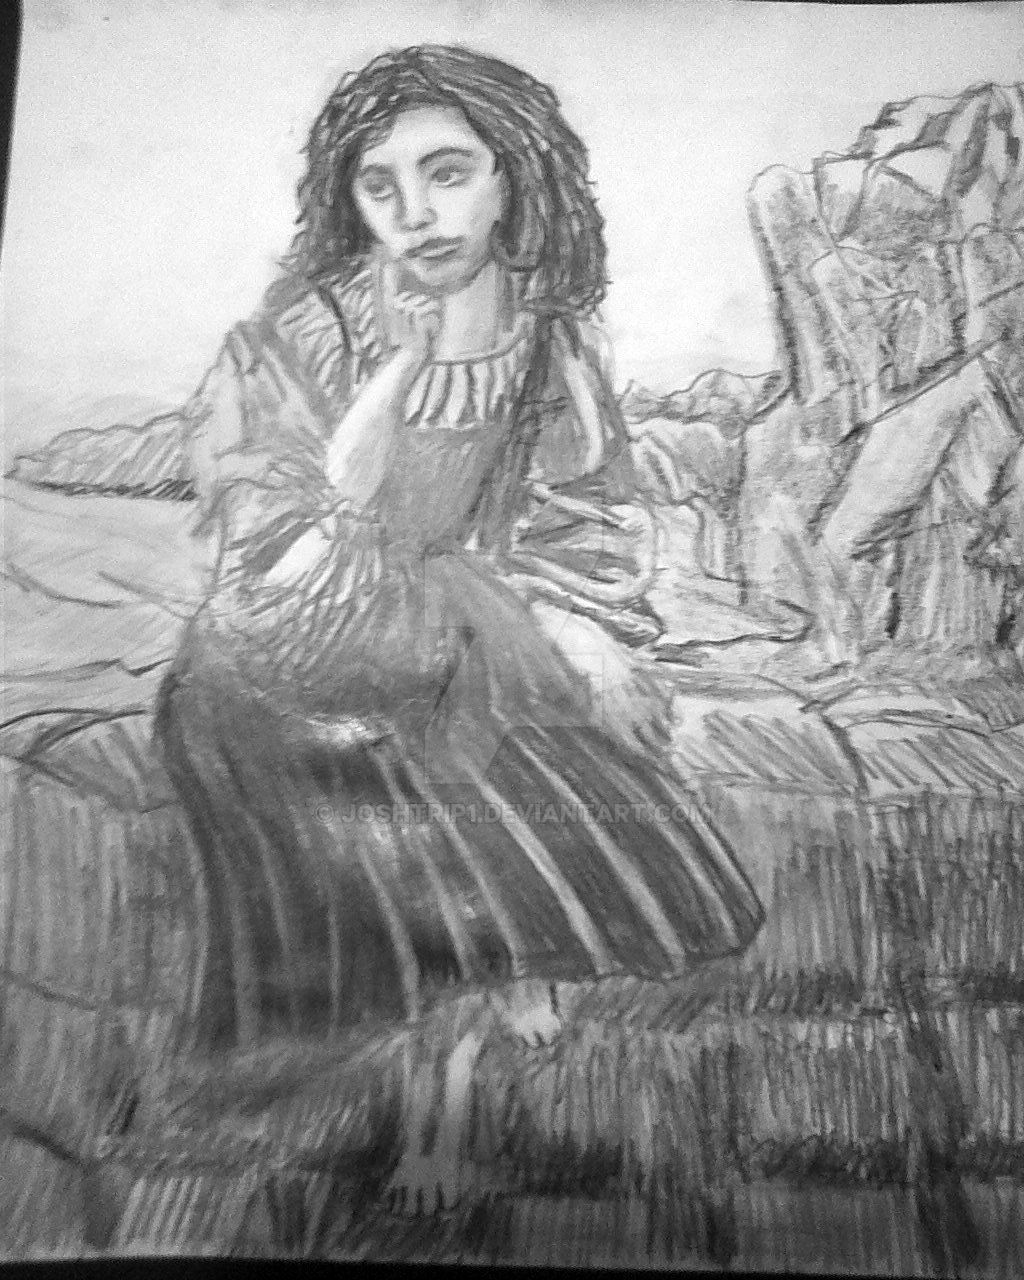 Woman sitting on Stone. by Joshtrip1